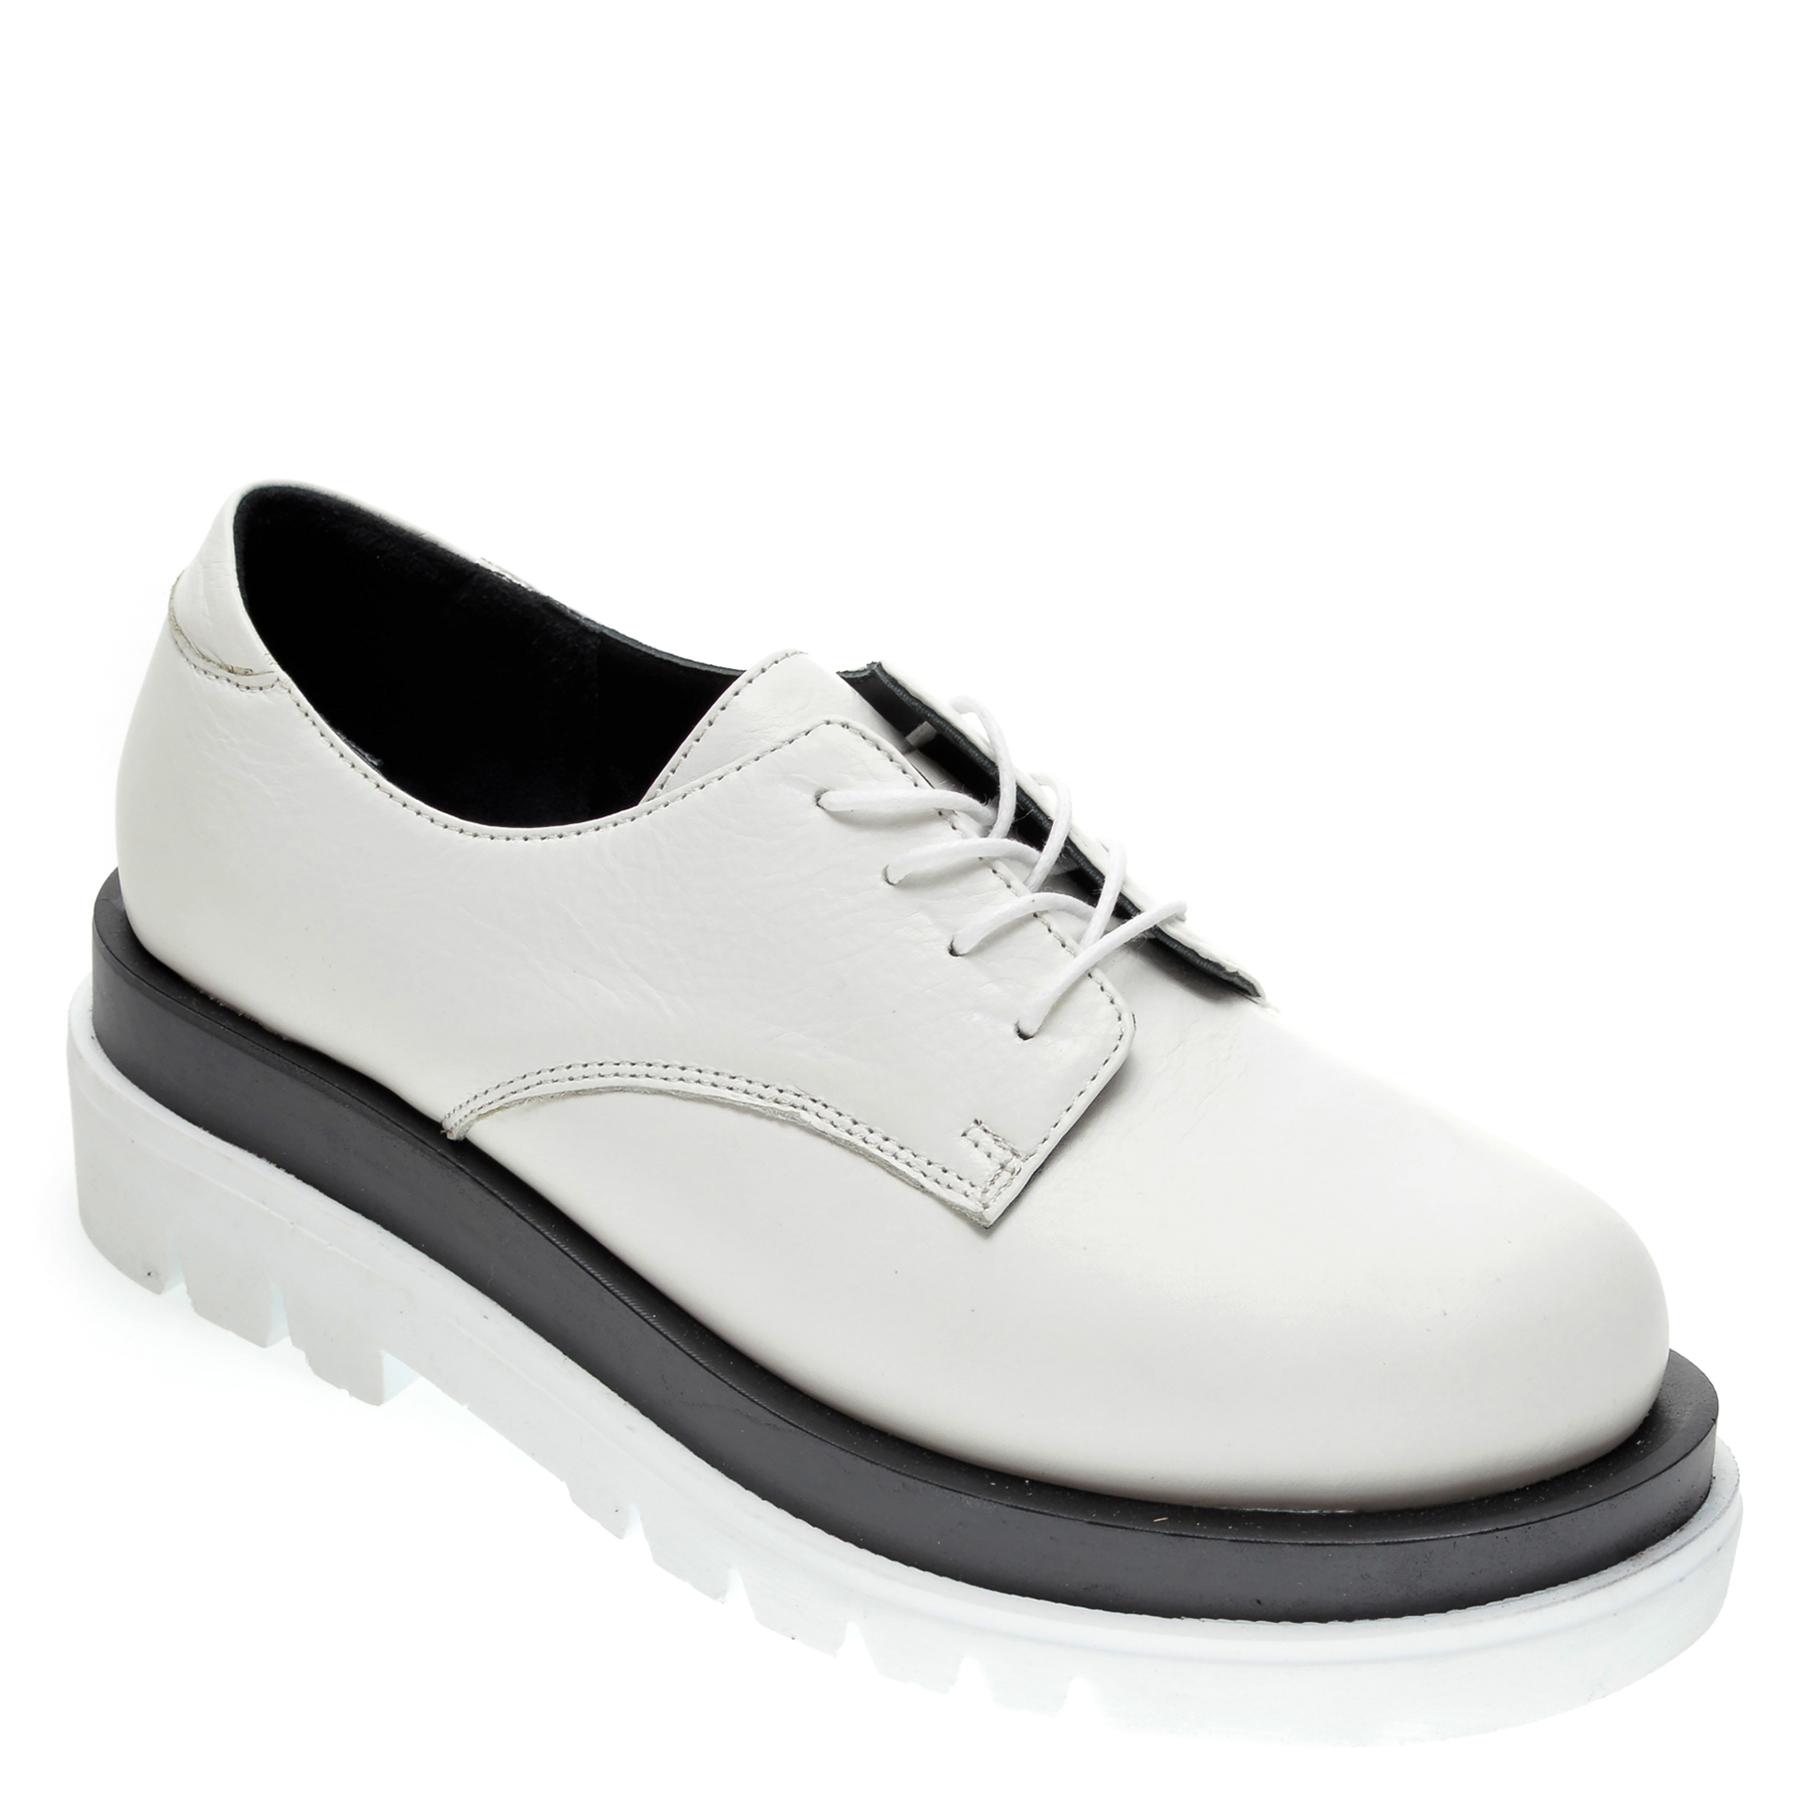 Pantofi Flavia Passini Albi, 2024, Din Piele Naturala